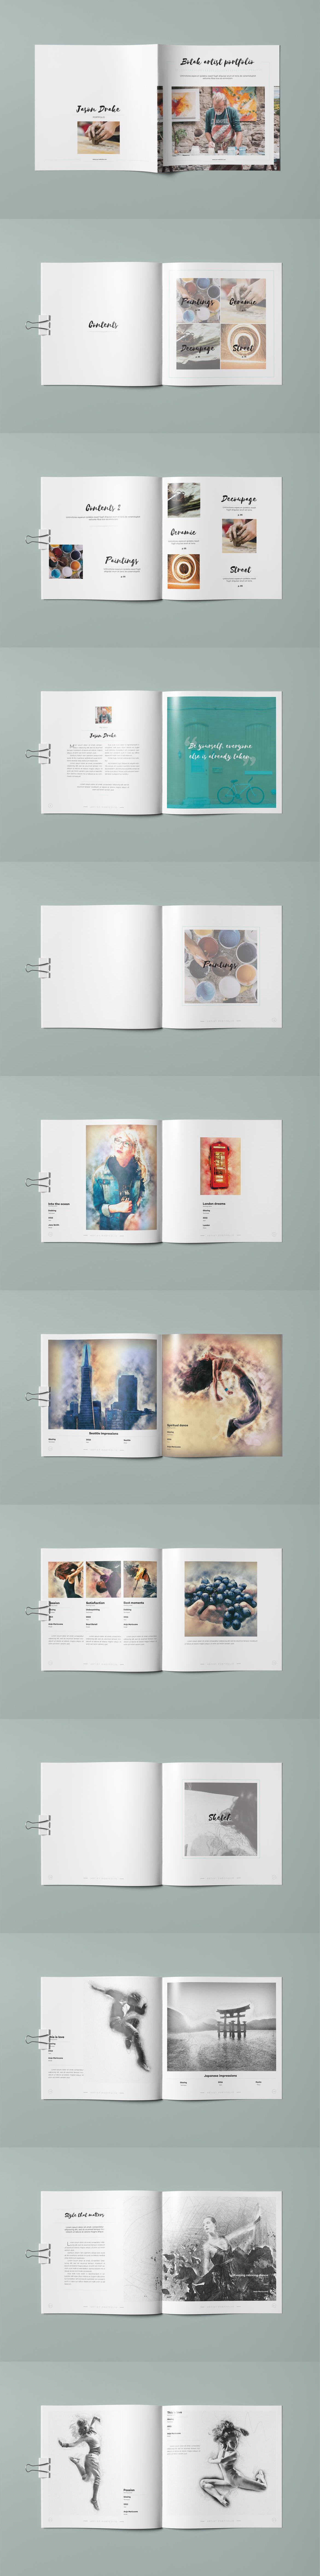 Botak Artist Portfolio Brochure Template InDesign INDD | Brochure ...